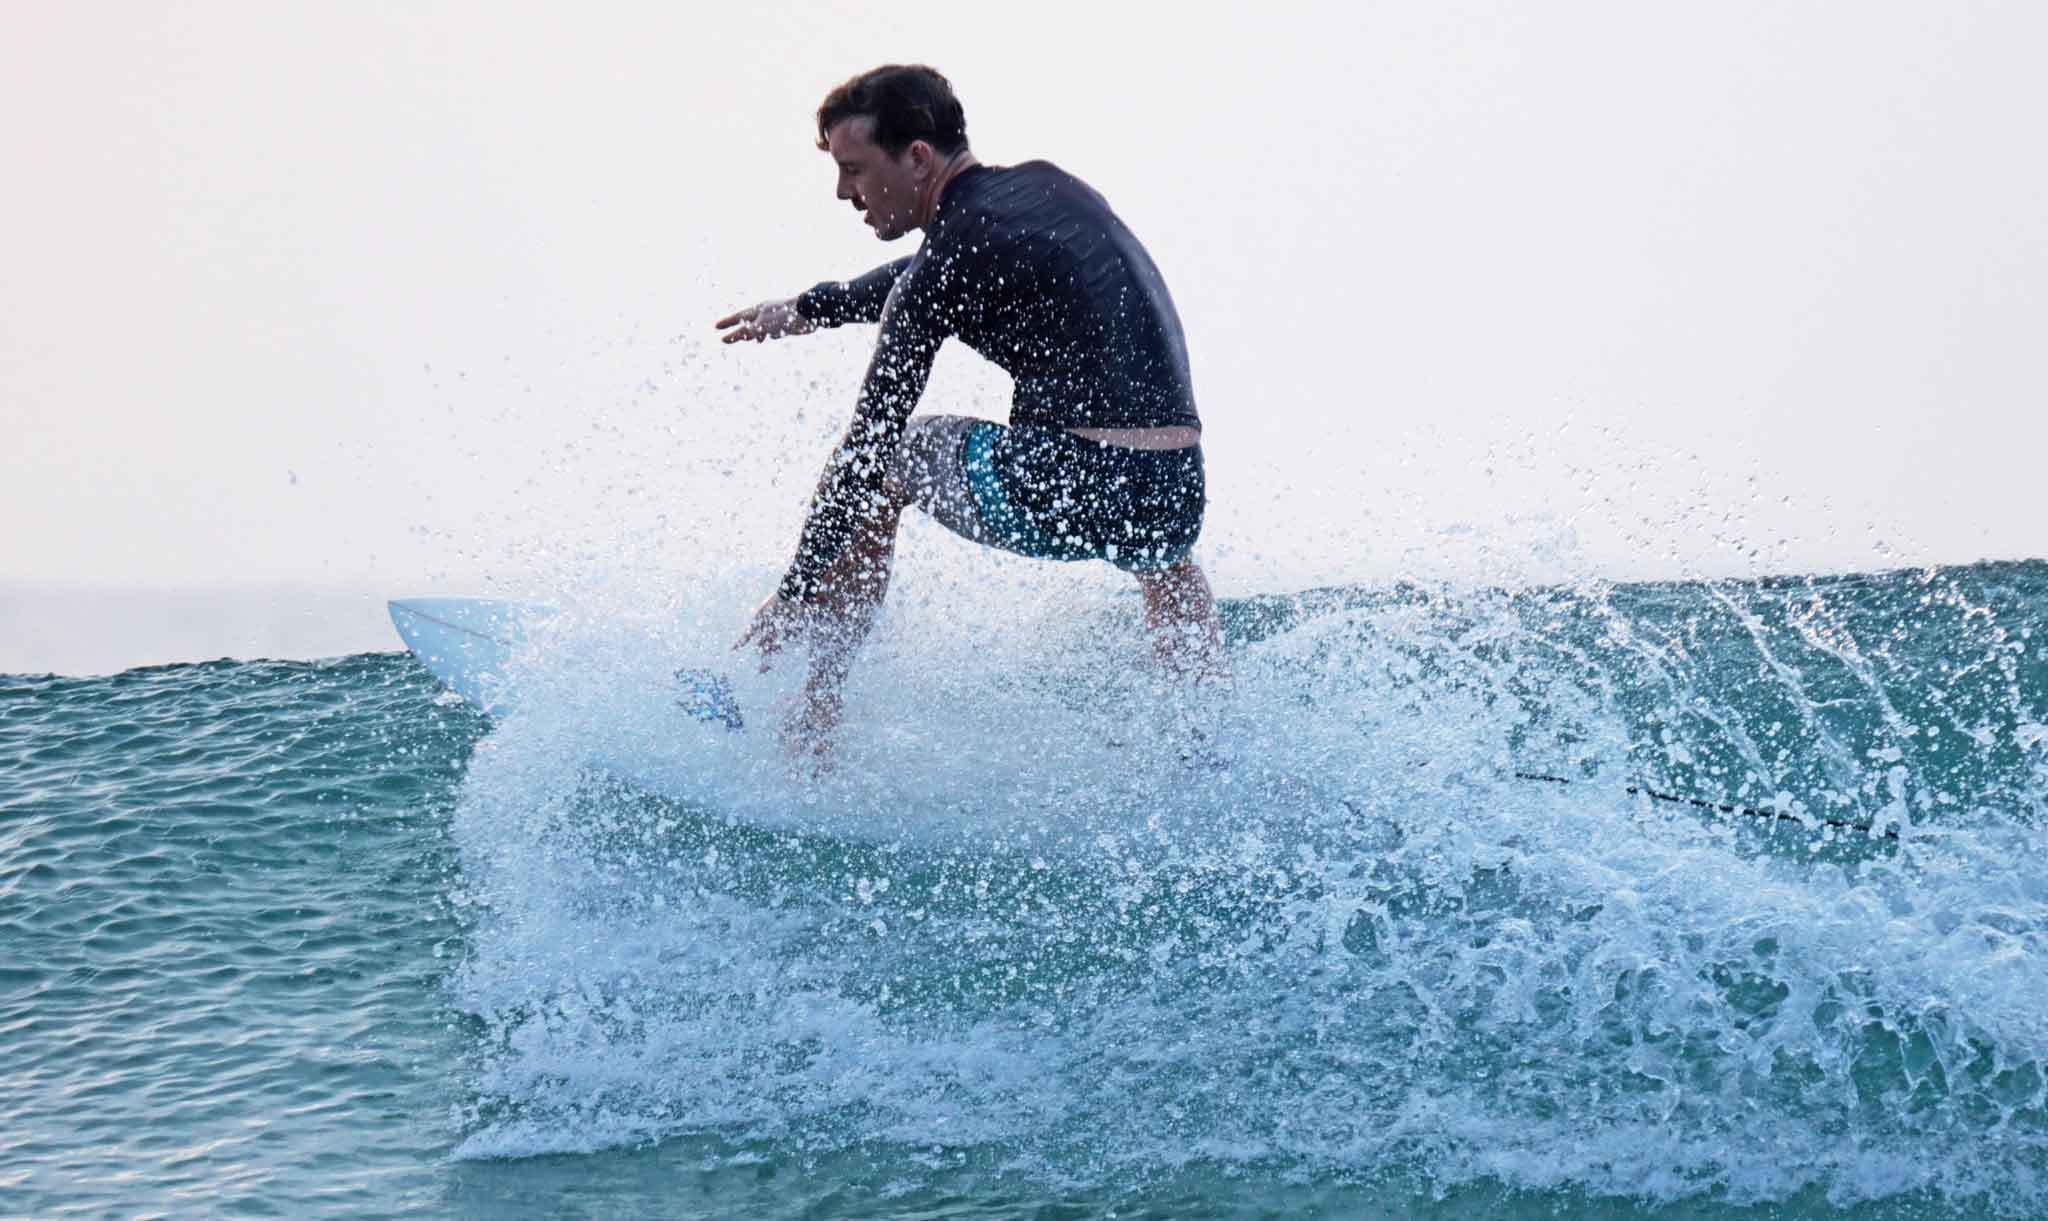 Surf's up, so surf up on Eastwards